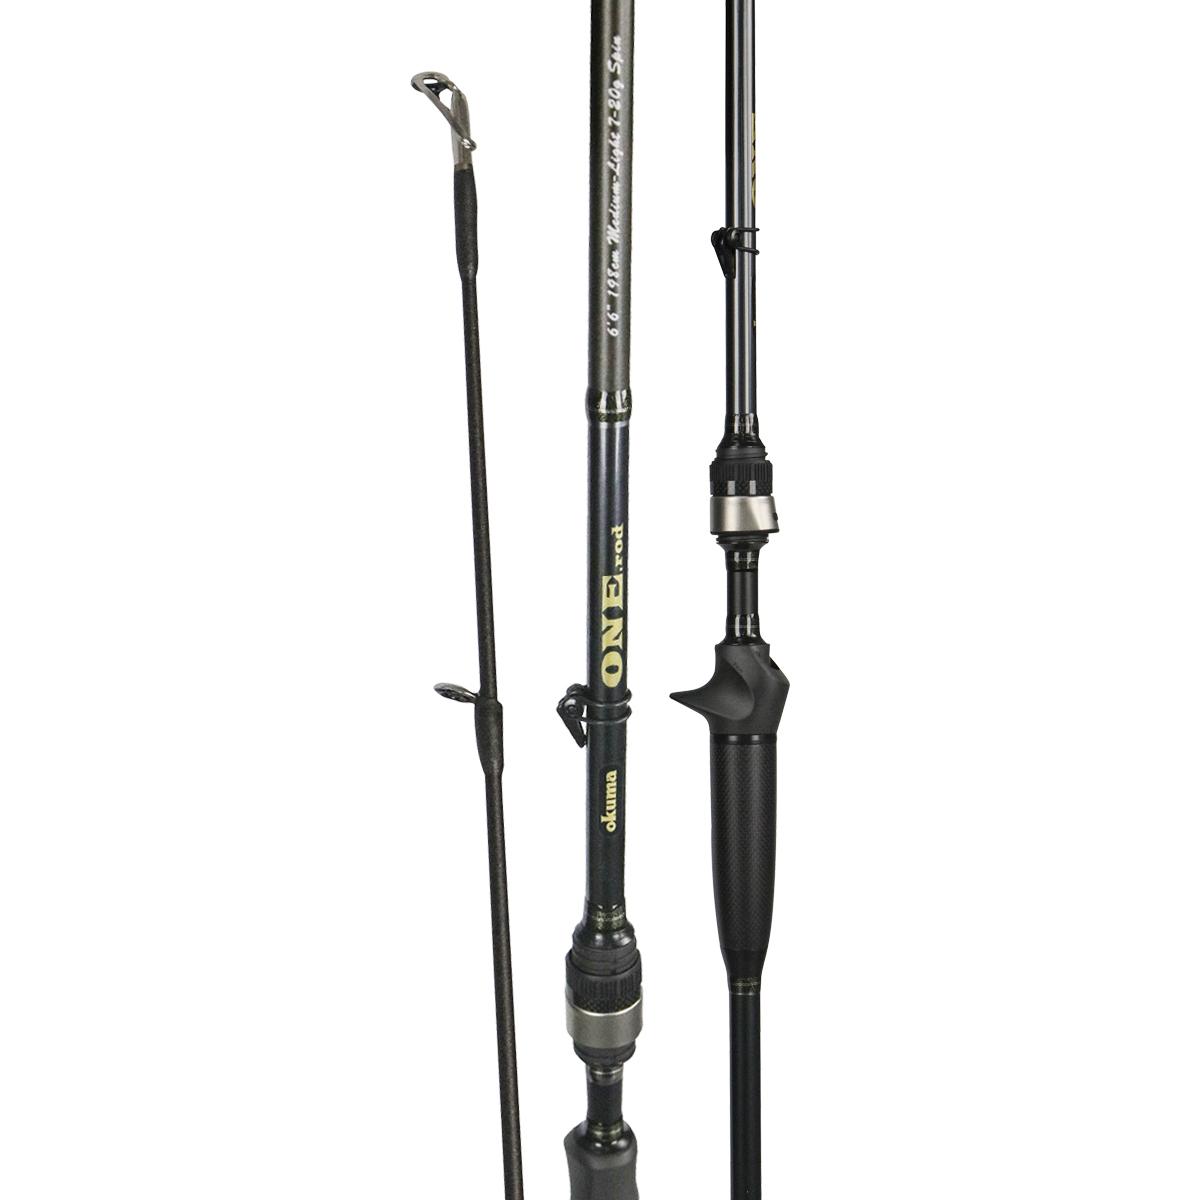 One rod okuma fishing rods and reels okuma fishing for Best bass fishing rod and reel